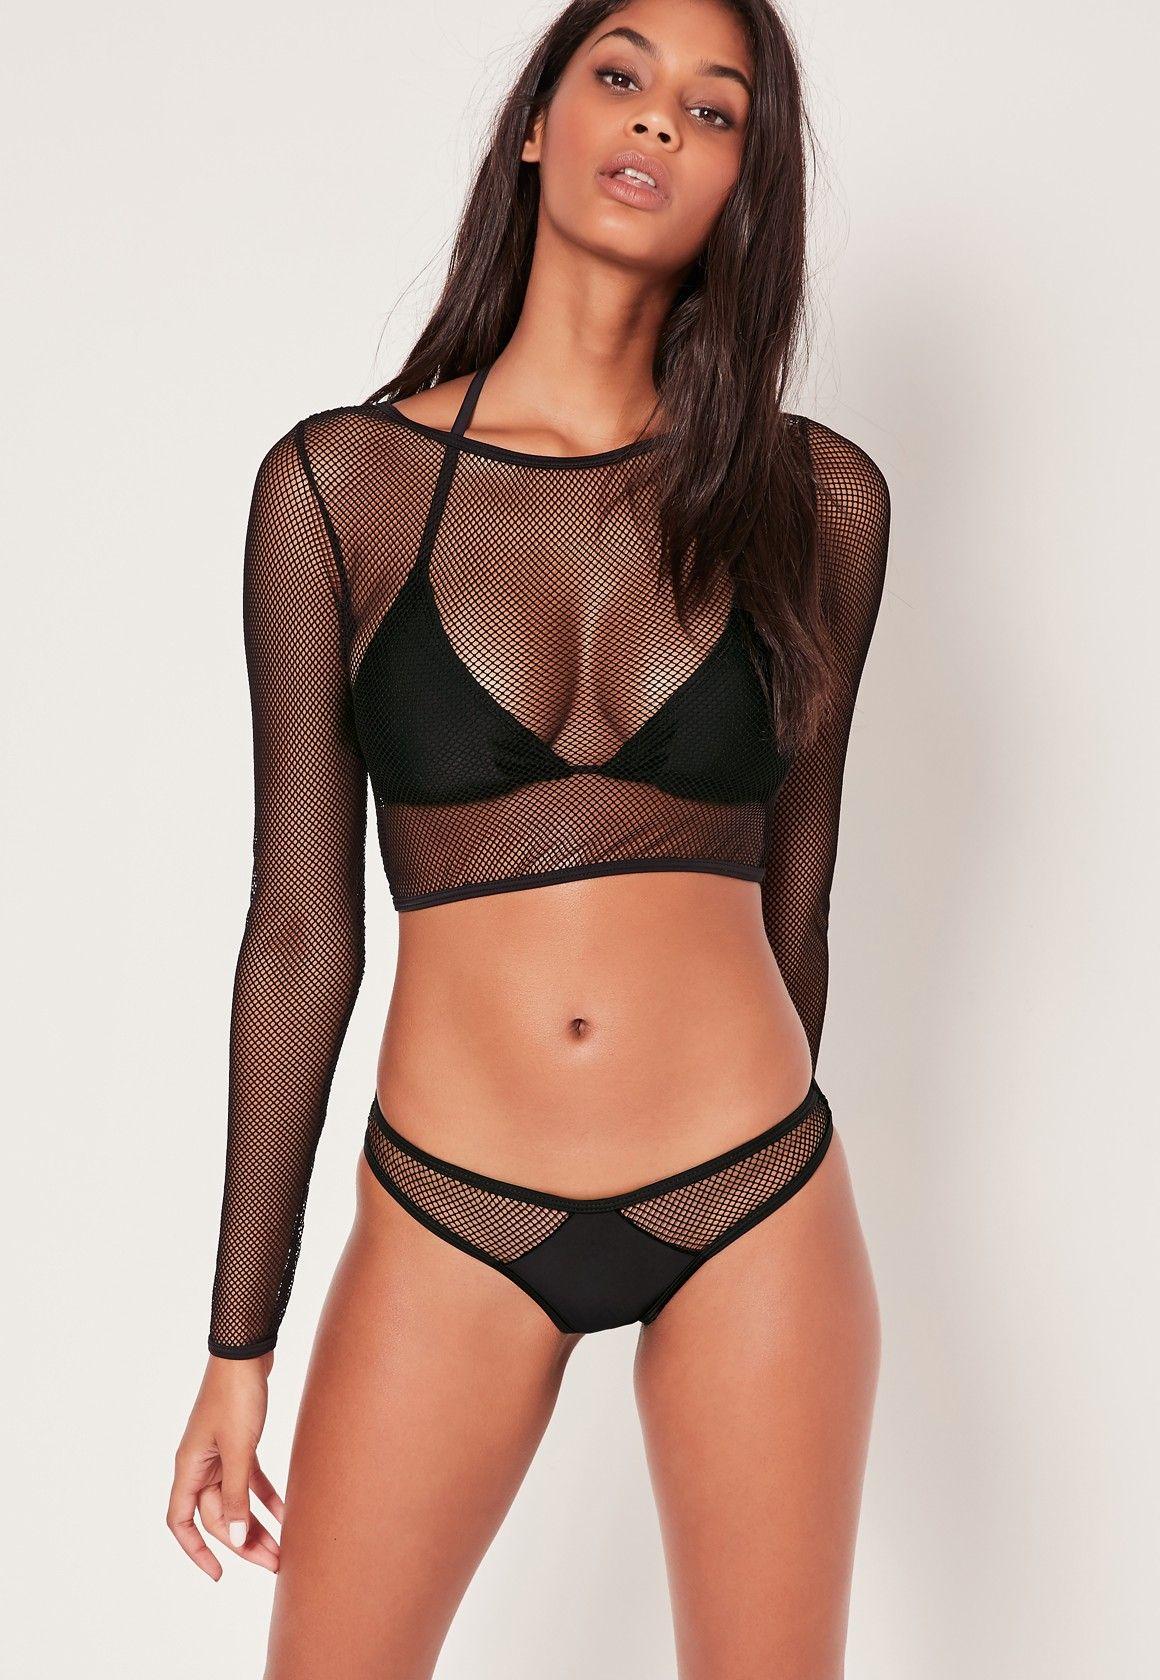 7a4cf03d855 Missguided - ABAD x Missguided Fishnet 3 Piece Bikini Set Black ...